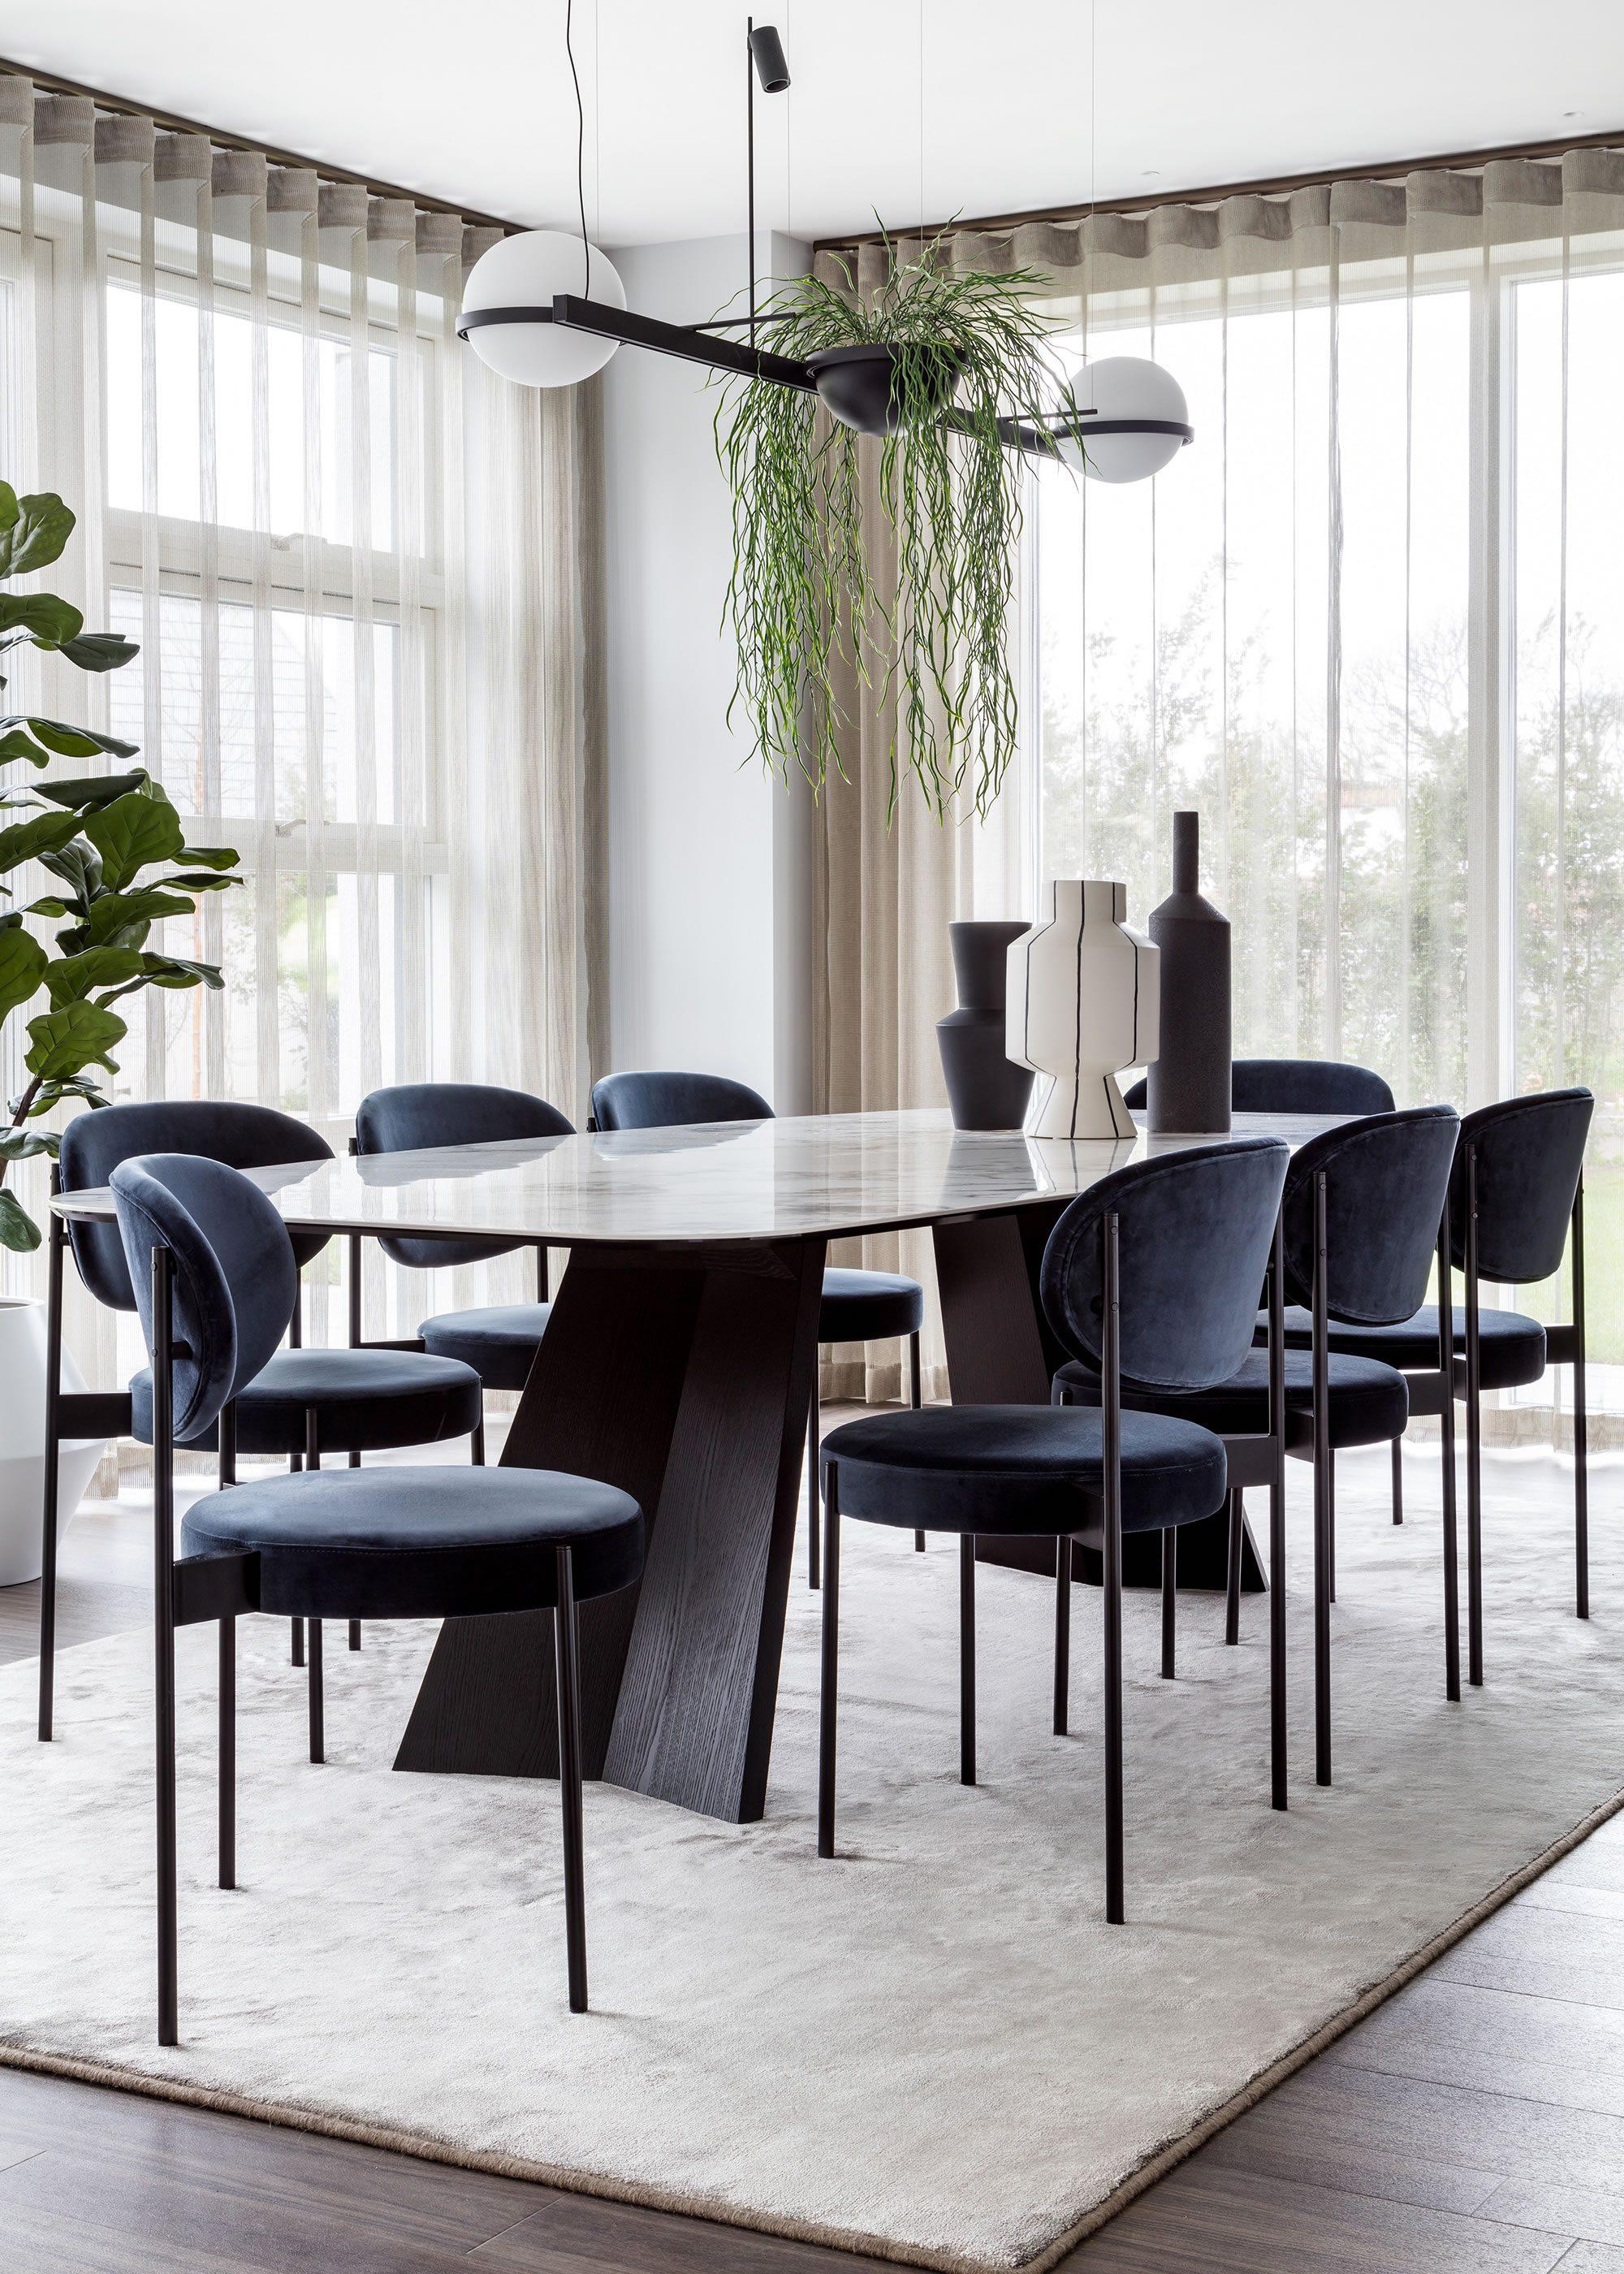 Honky Design Interior Dining Room